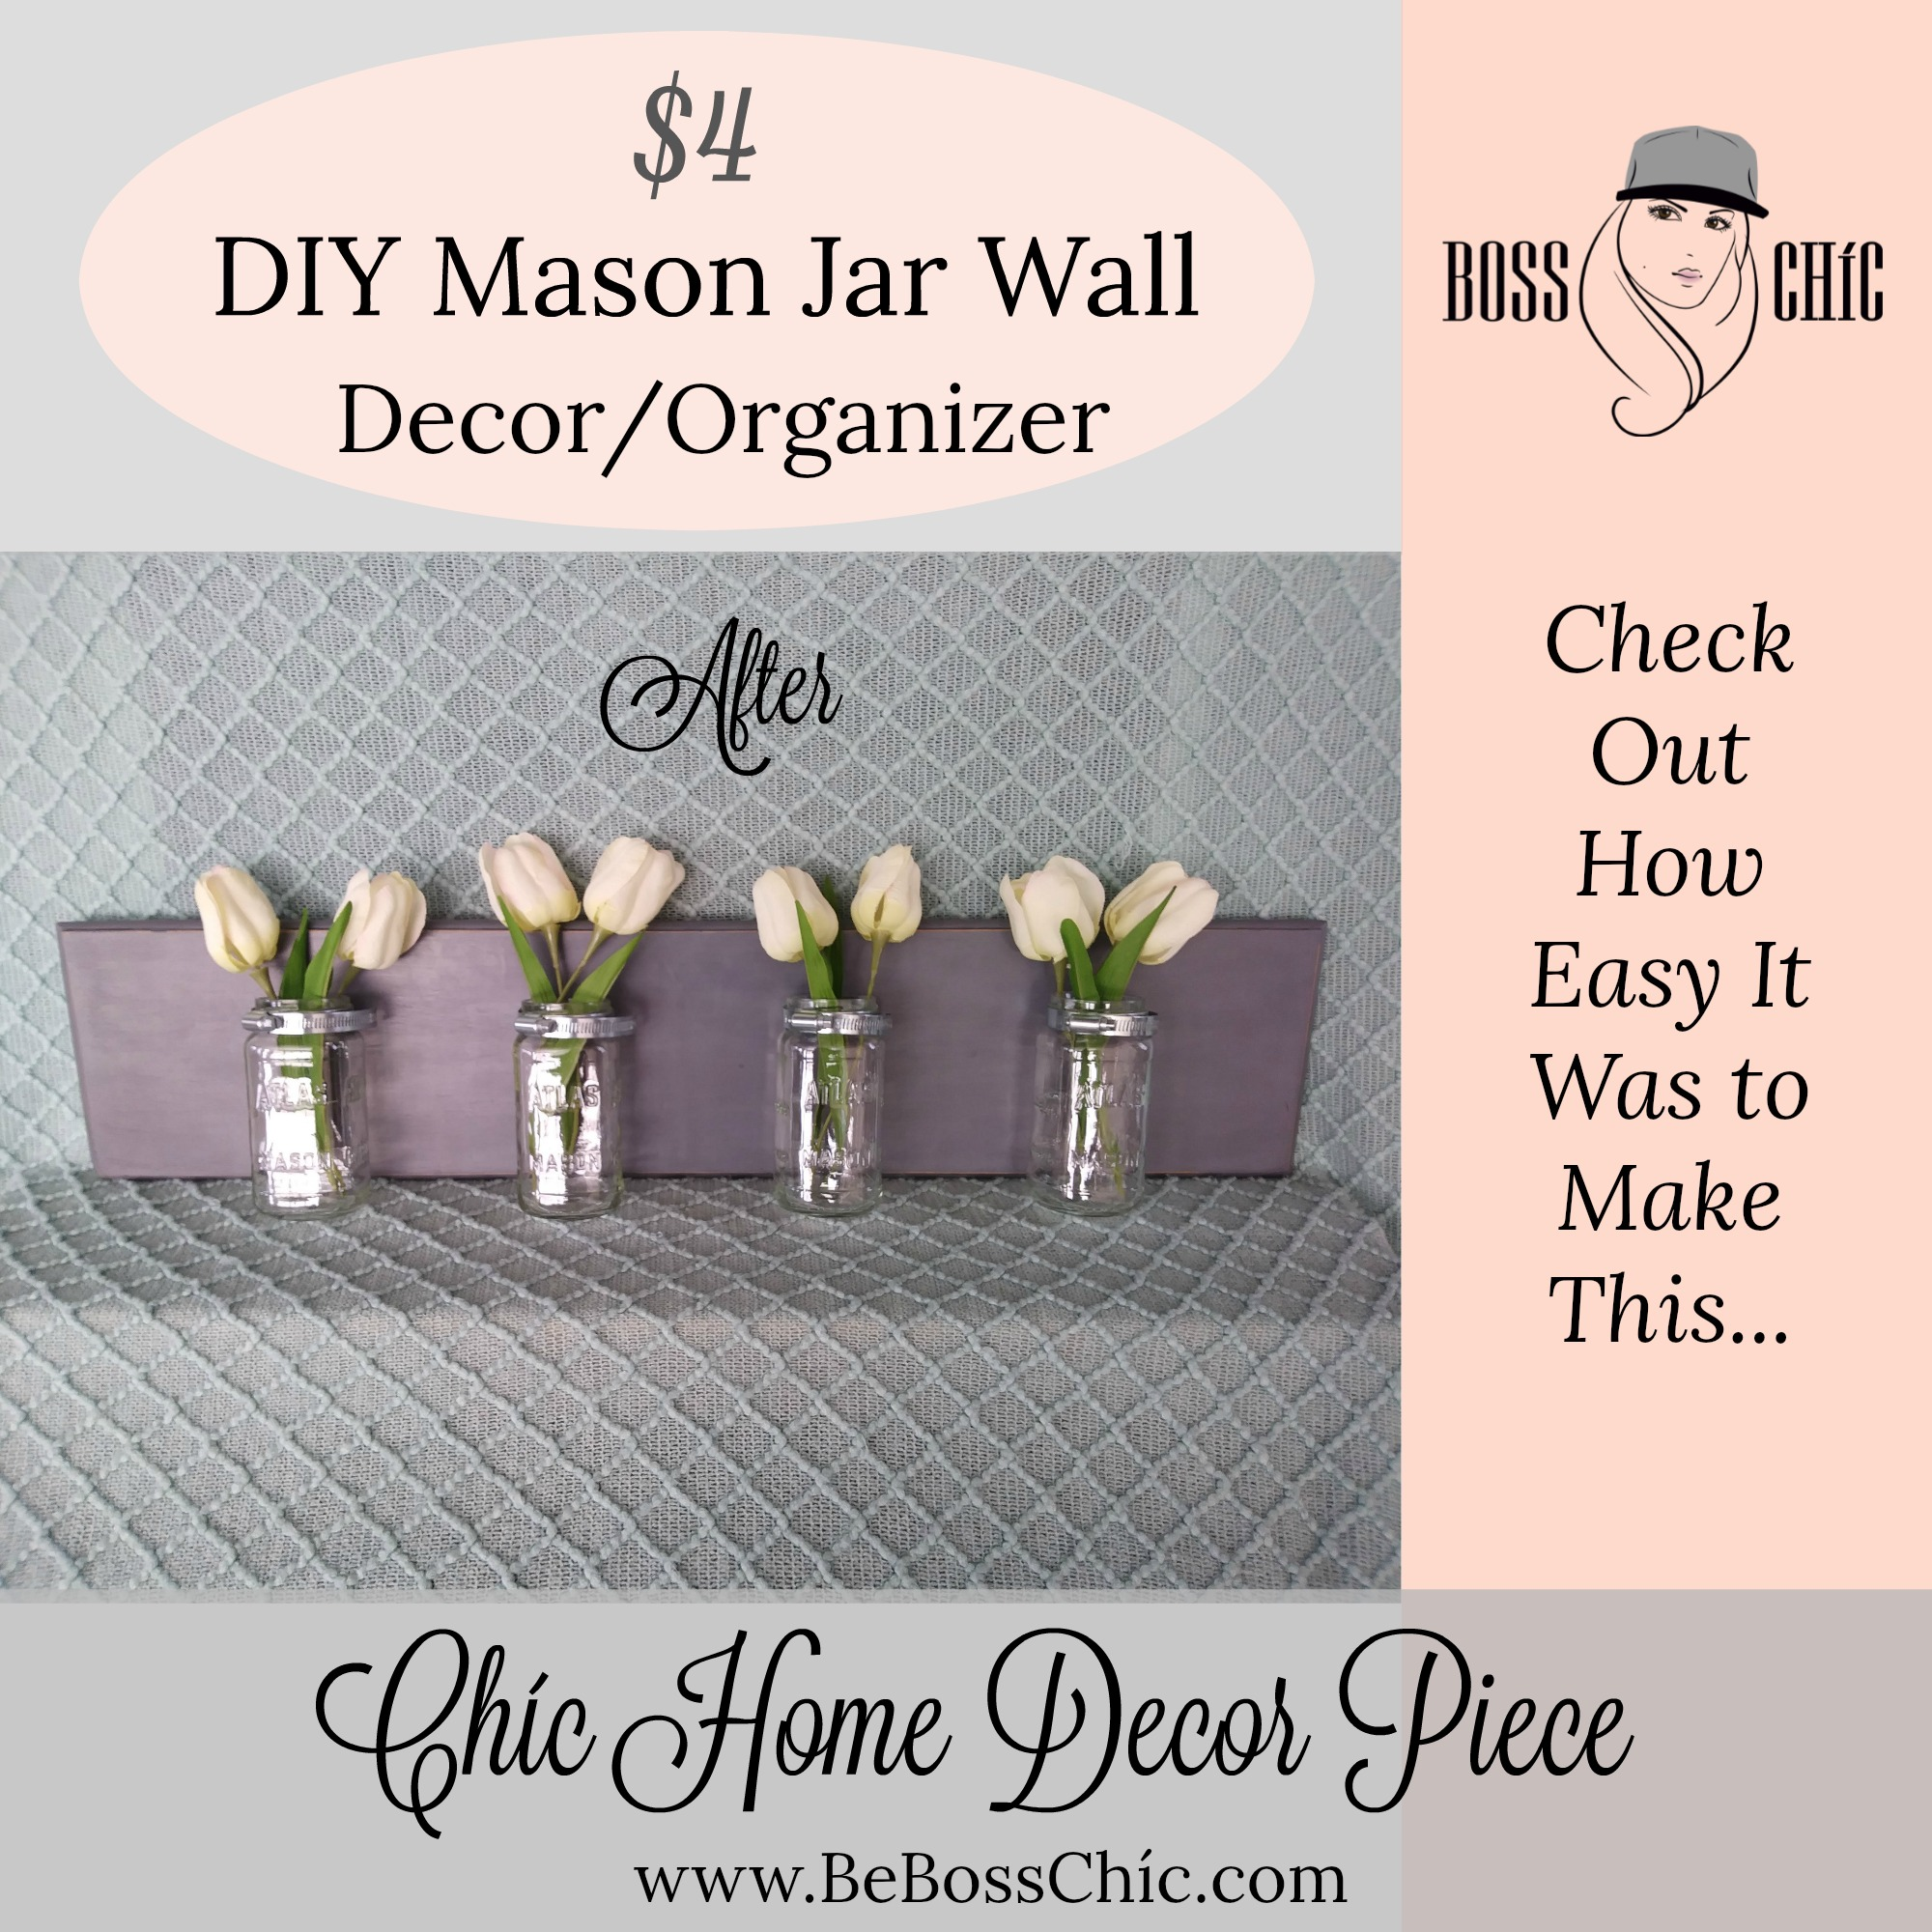 Recycled Jars And Dresser Drawer 4 Diy Mason Jar Wall Decor